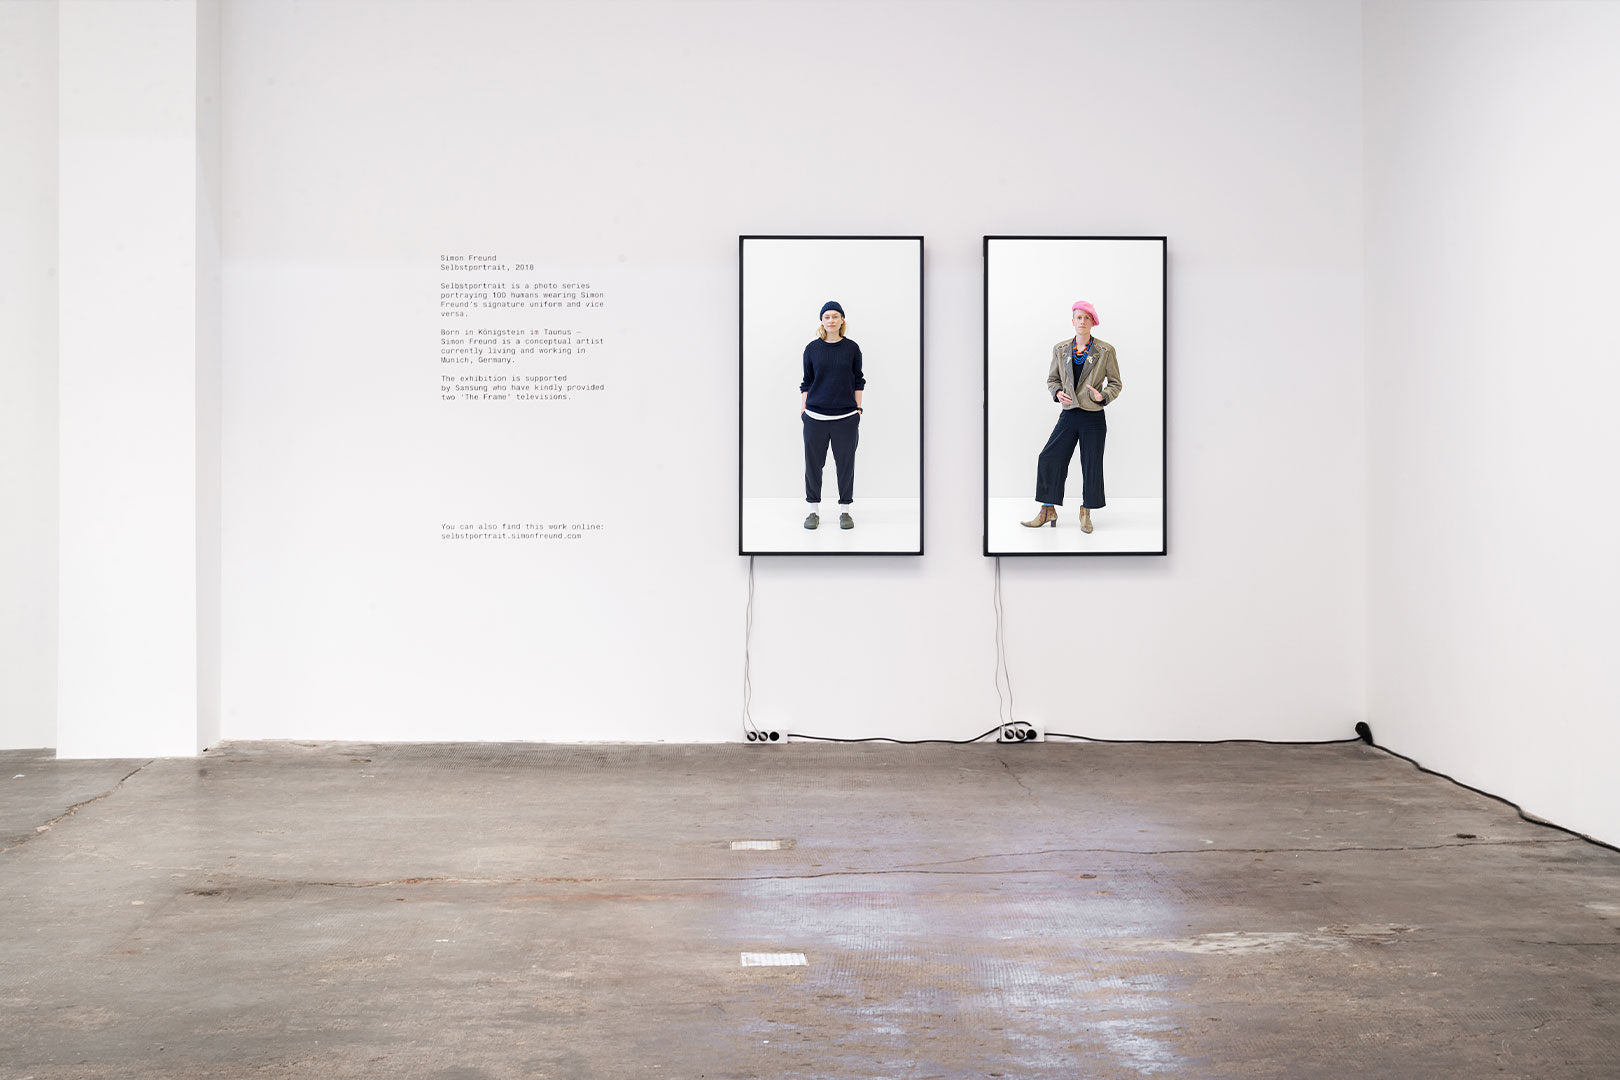 Kunstprojekt mit Profil